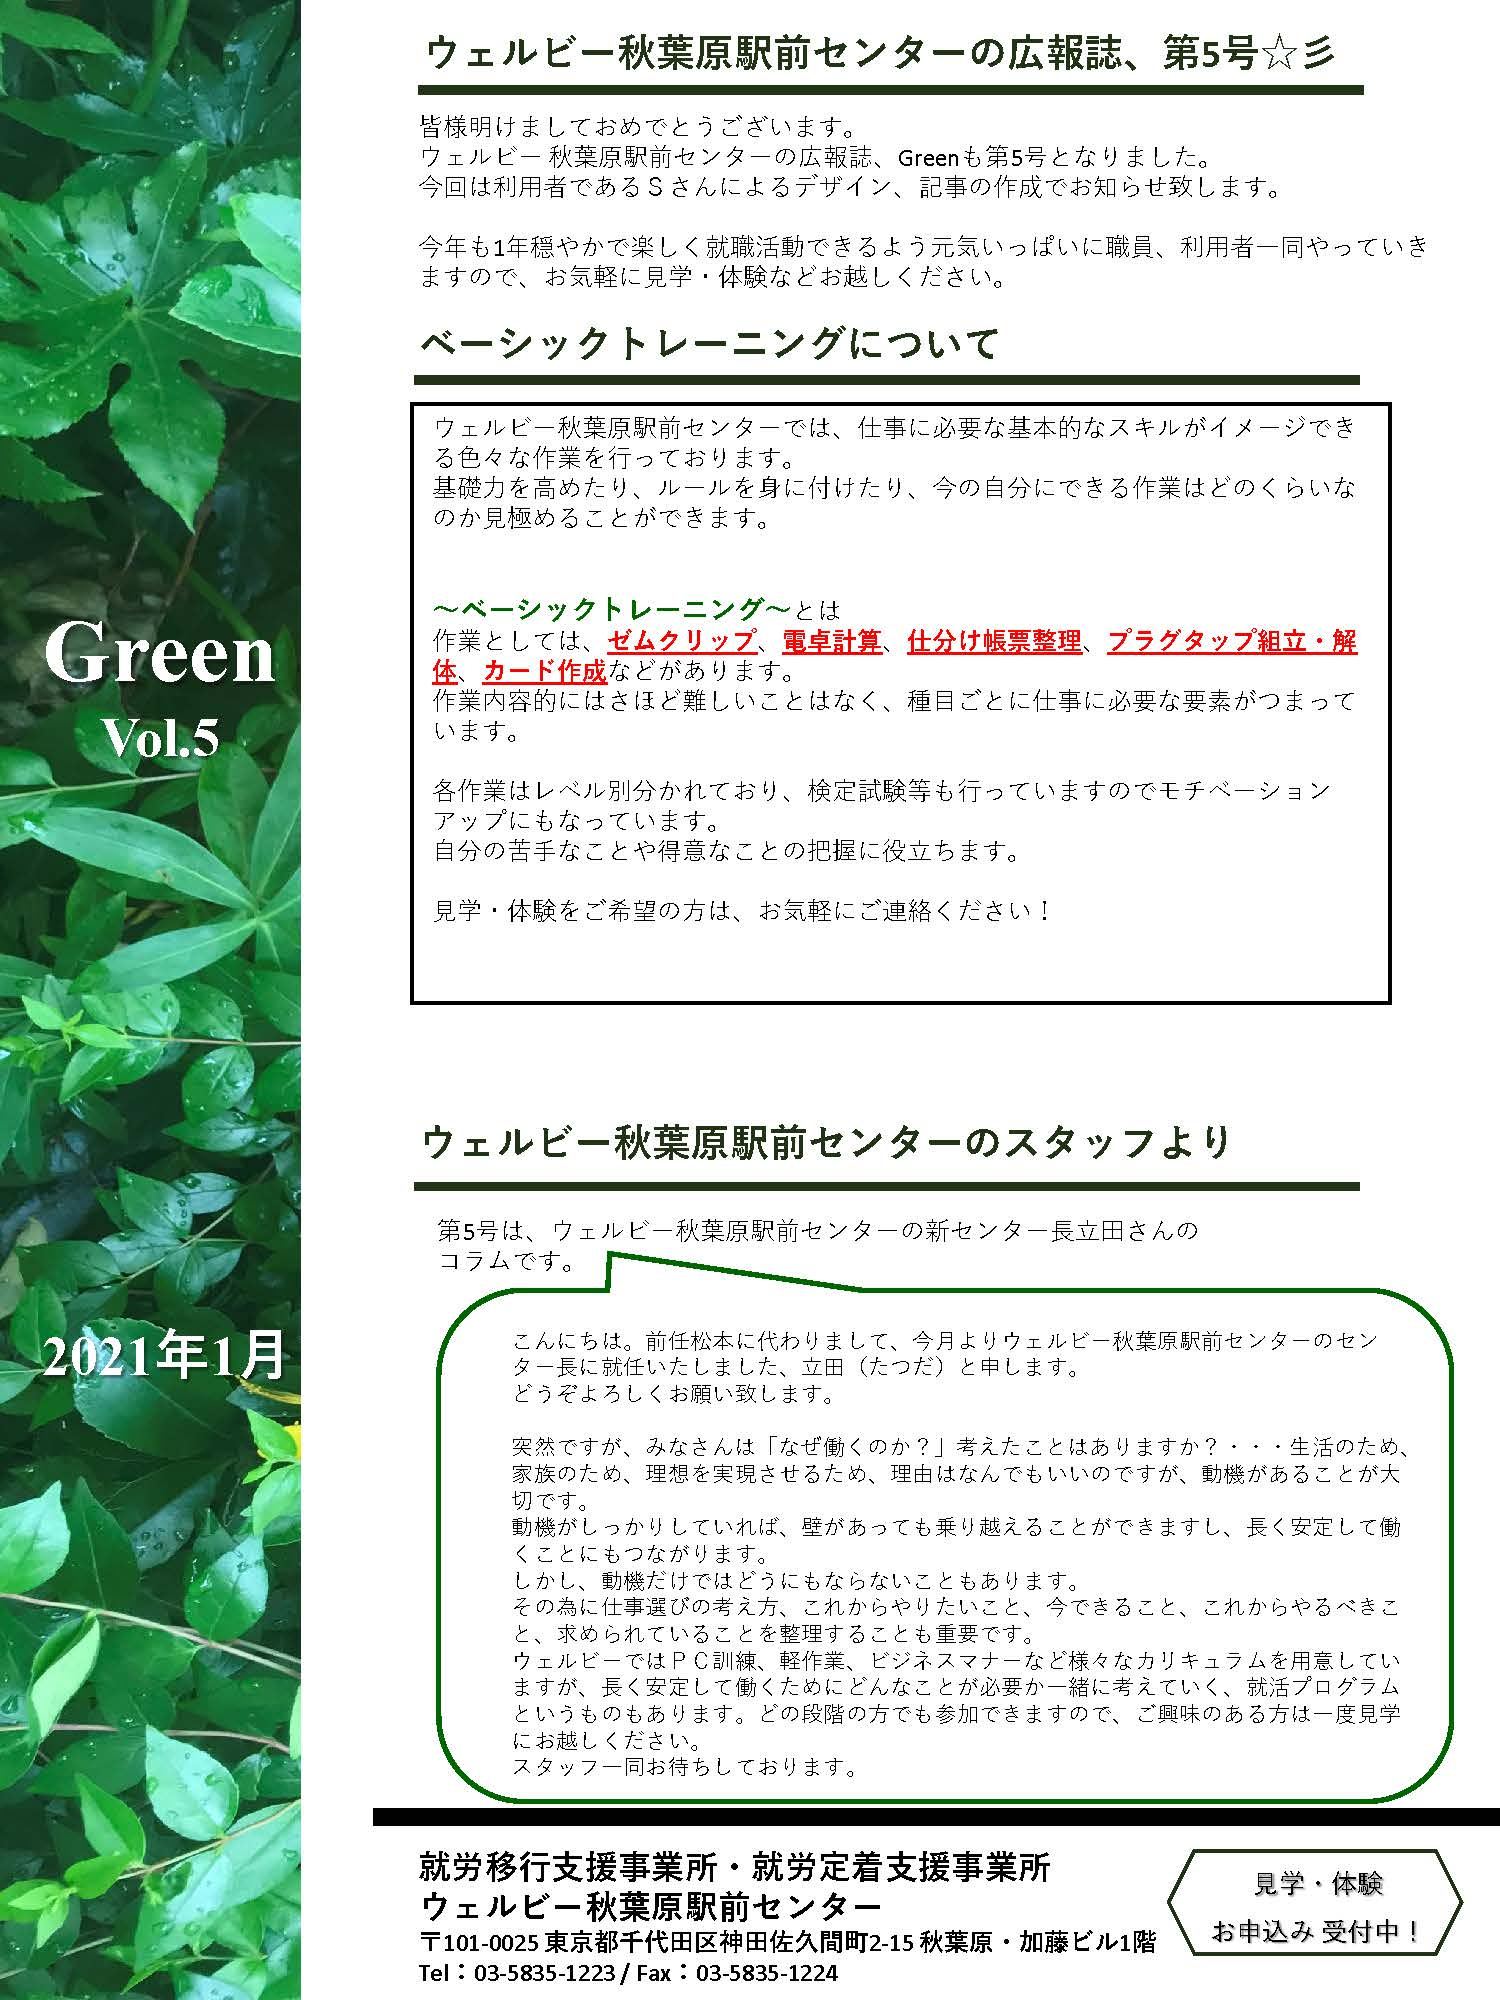 【Green_vol.5】2020年1月号_ブログ掲載用編集版_ページ_1